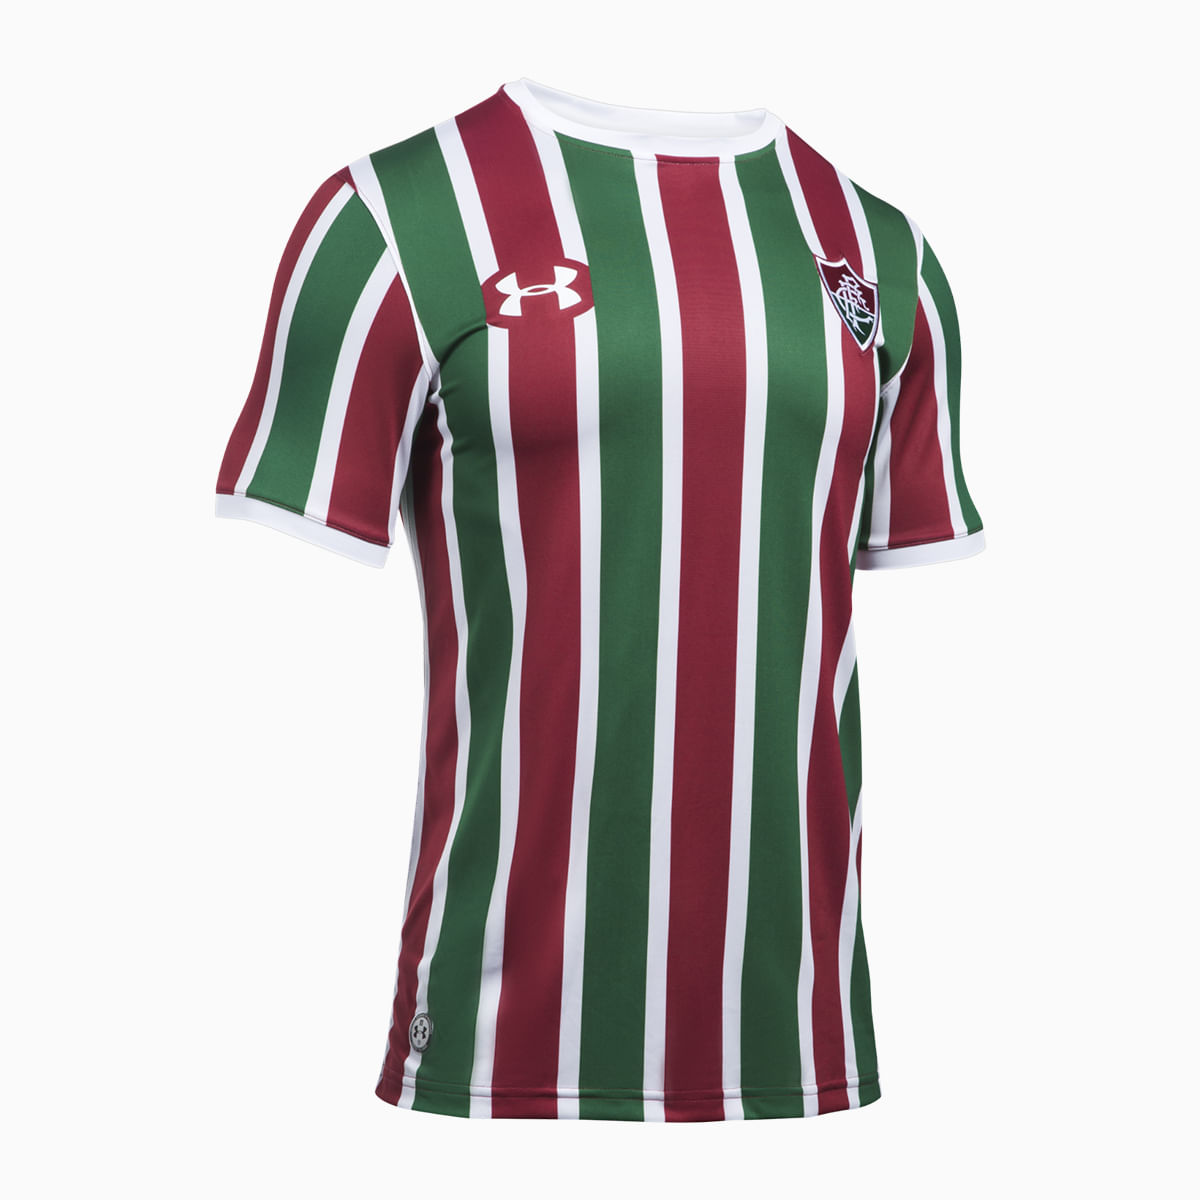 d36a24bec19 Camiseta-UA-Treino-Verde-2019 - fluminense